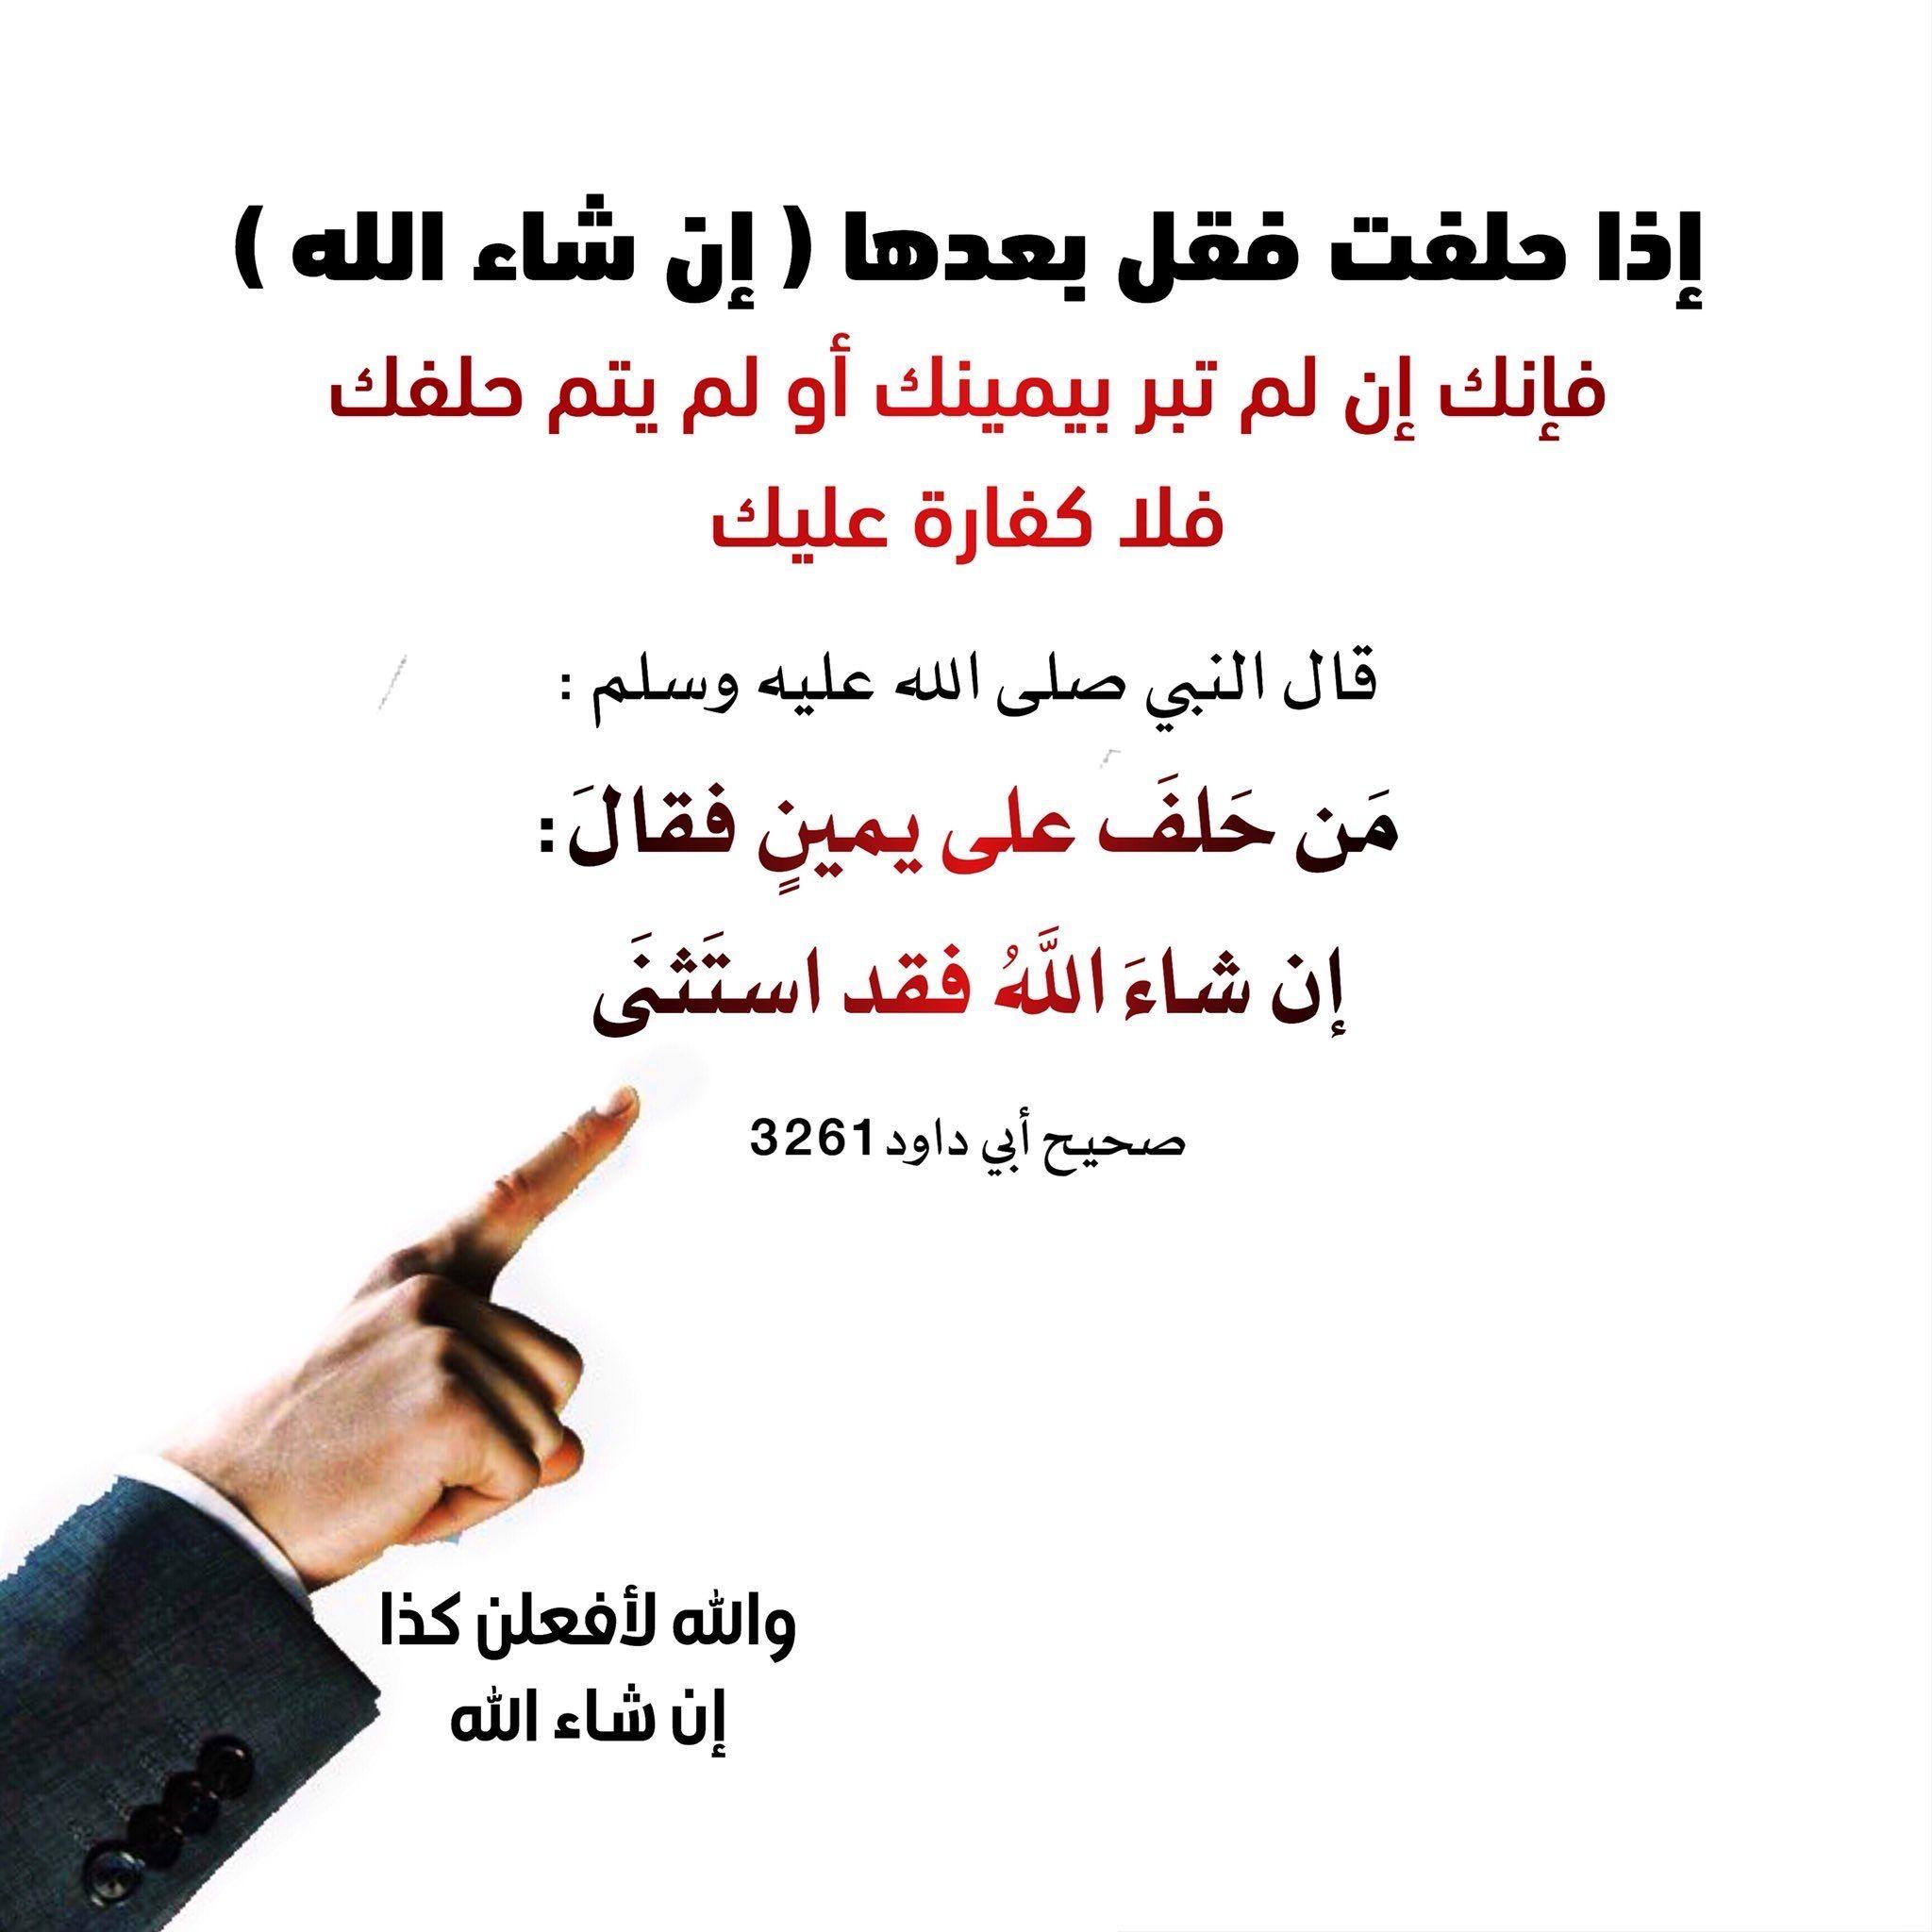 Pin By Manal A On أحاديث نبوية Quran Verses Islamic Quotes Quran Tafseer